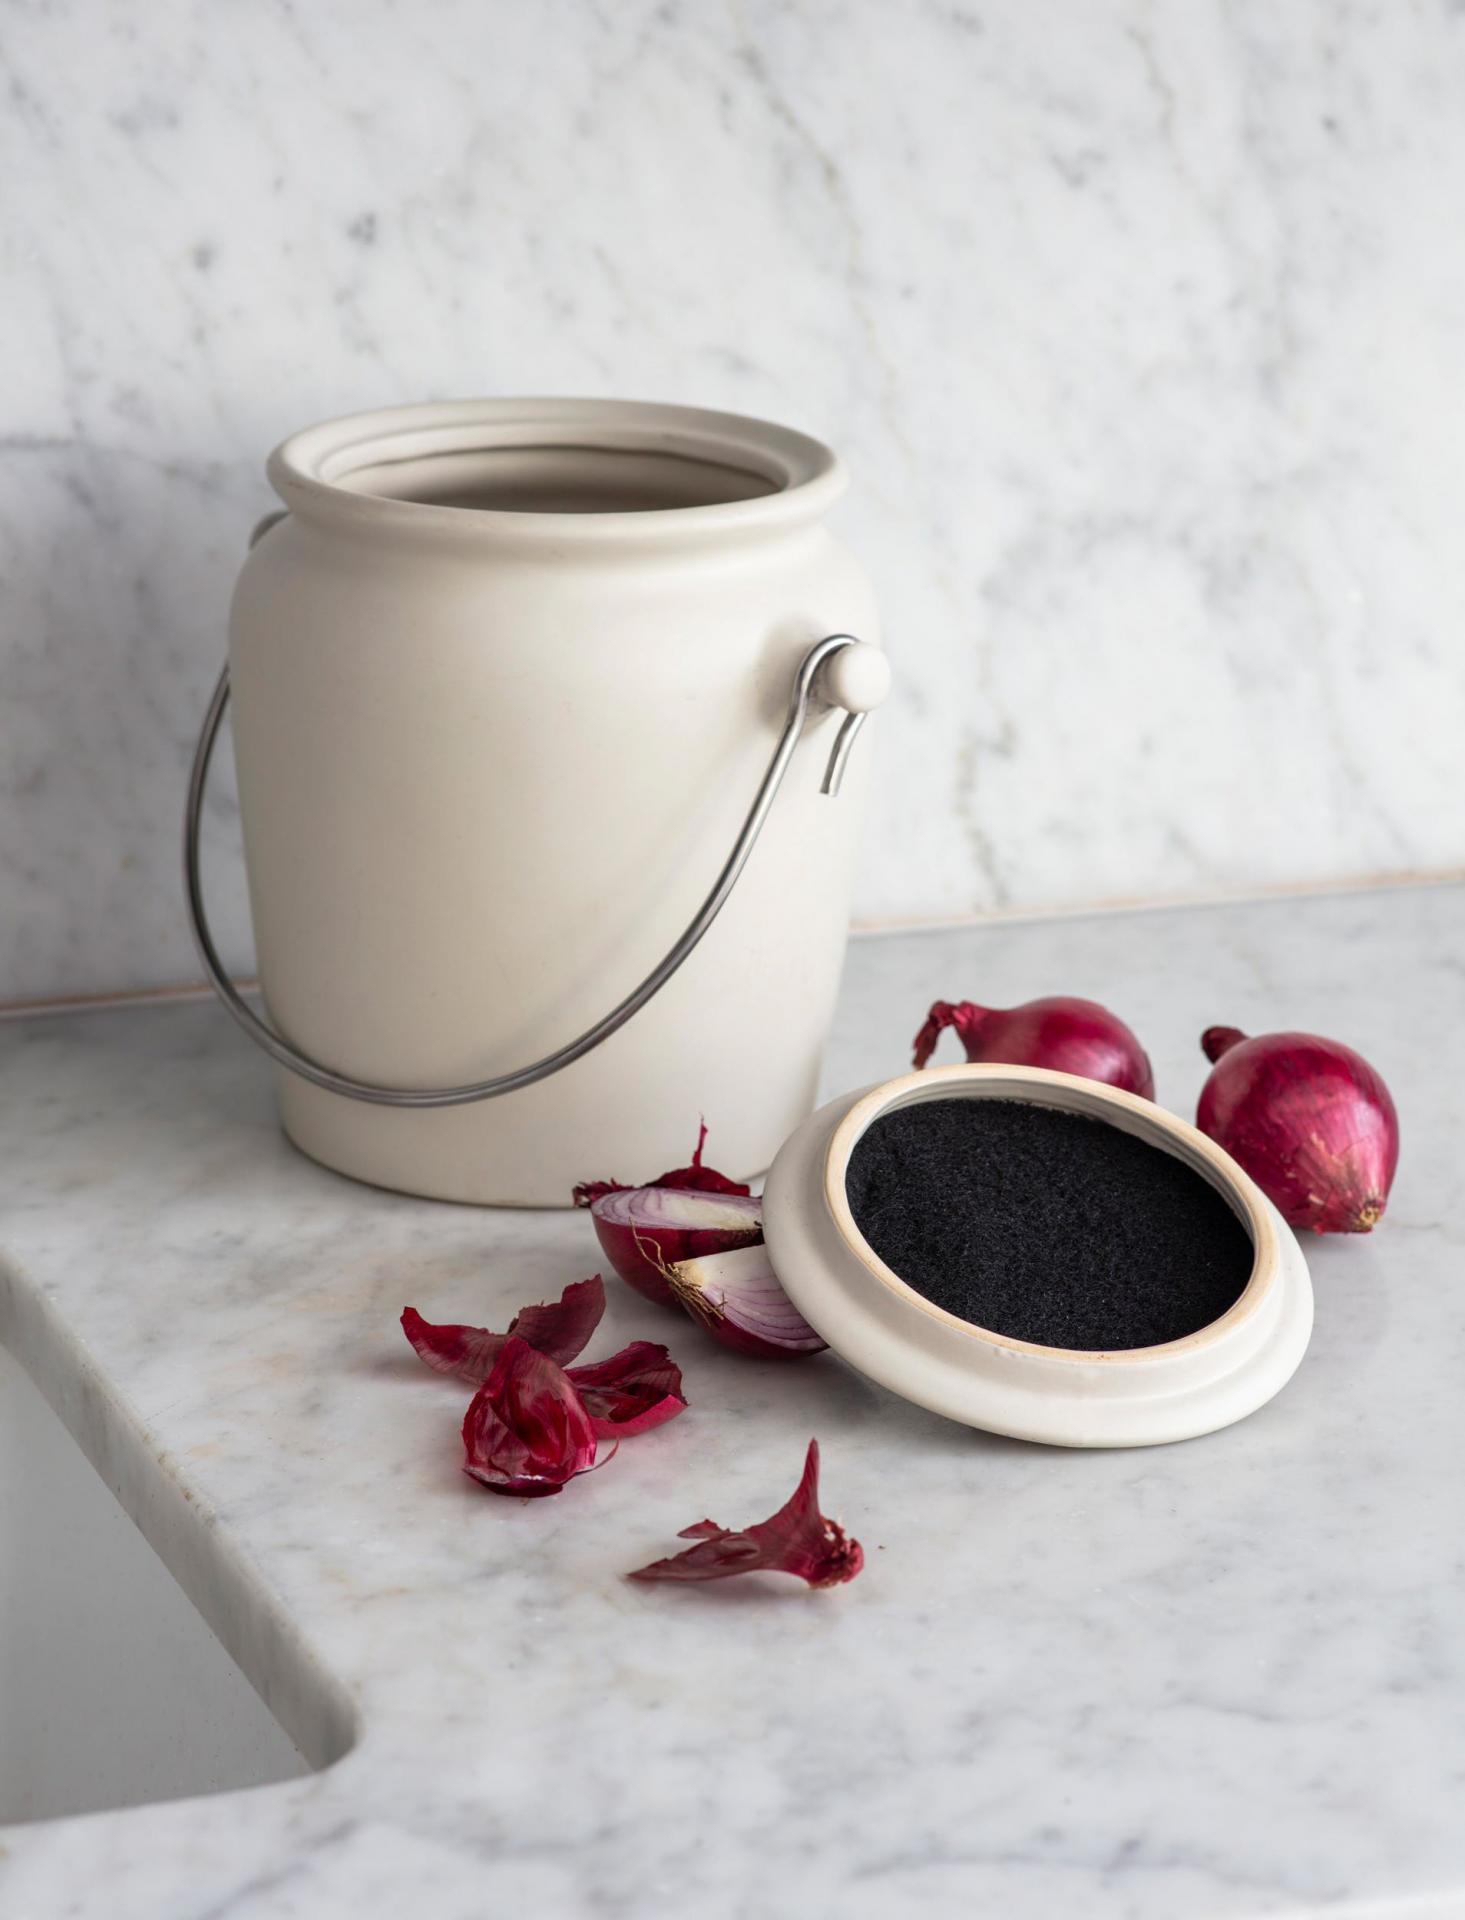 Garden Trading Keramická nádoba na kompost, béžová barva, keramika